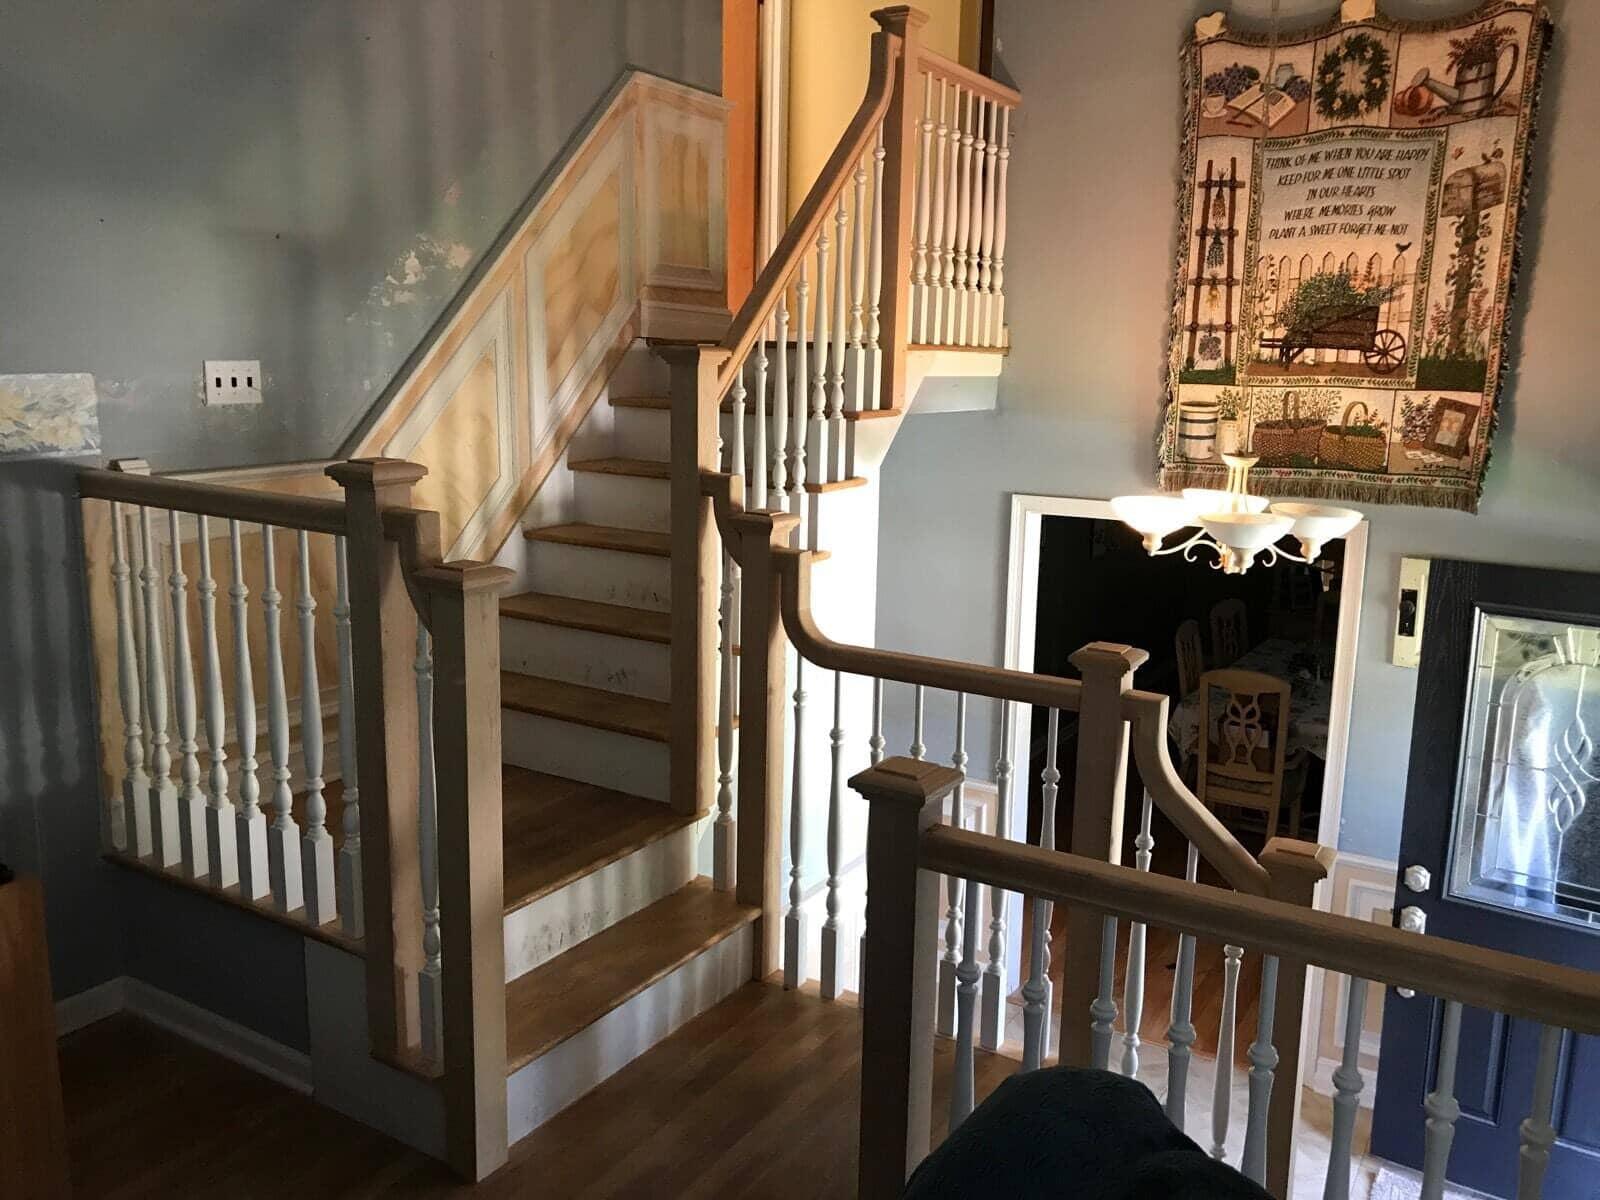 Stairs and Railings – Jackson NJ DMD Stairs LLC